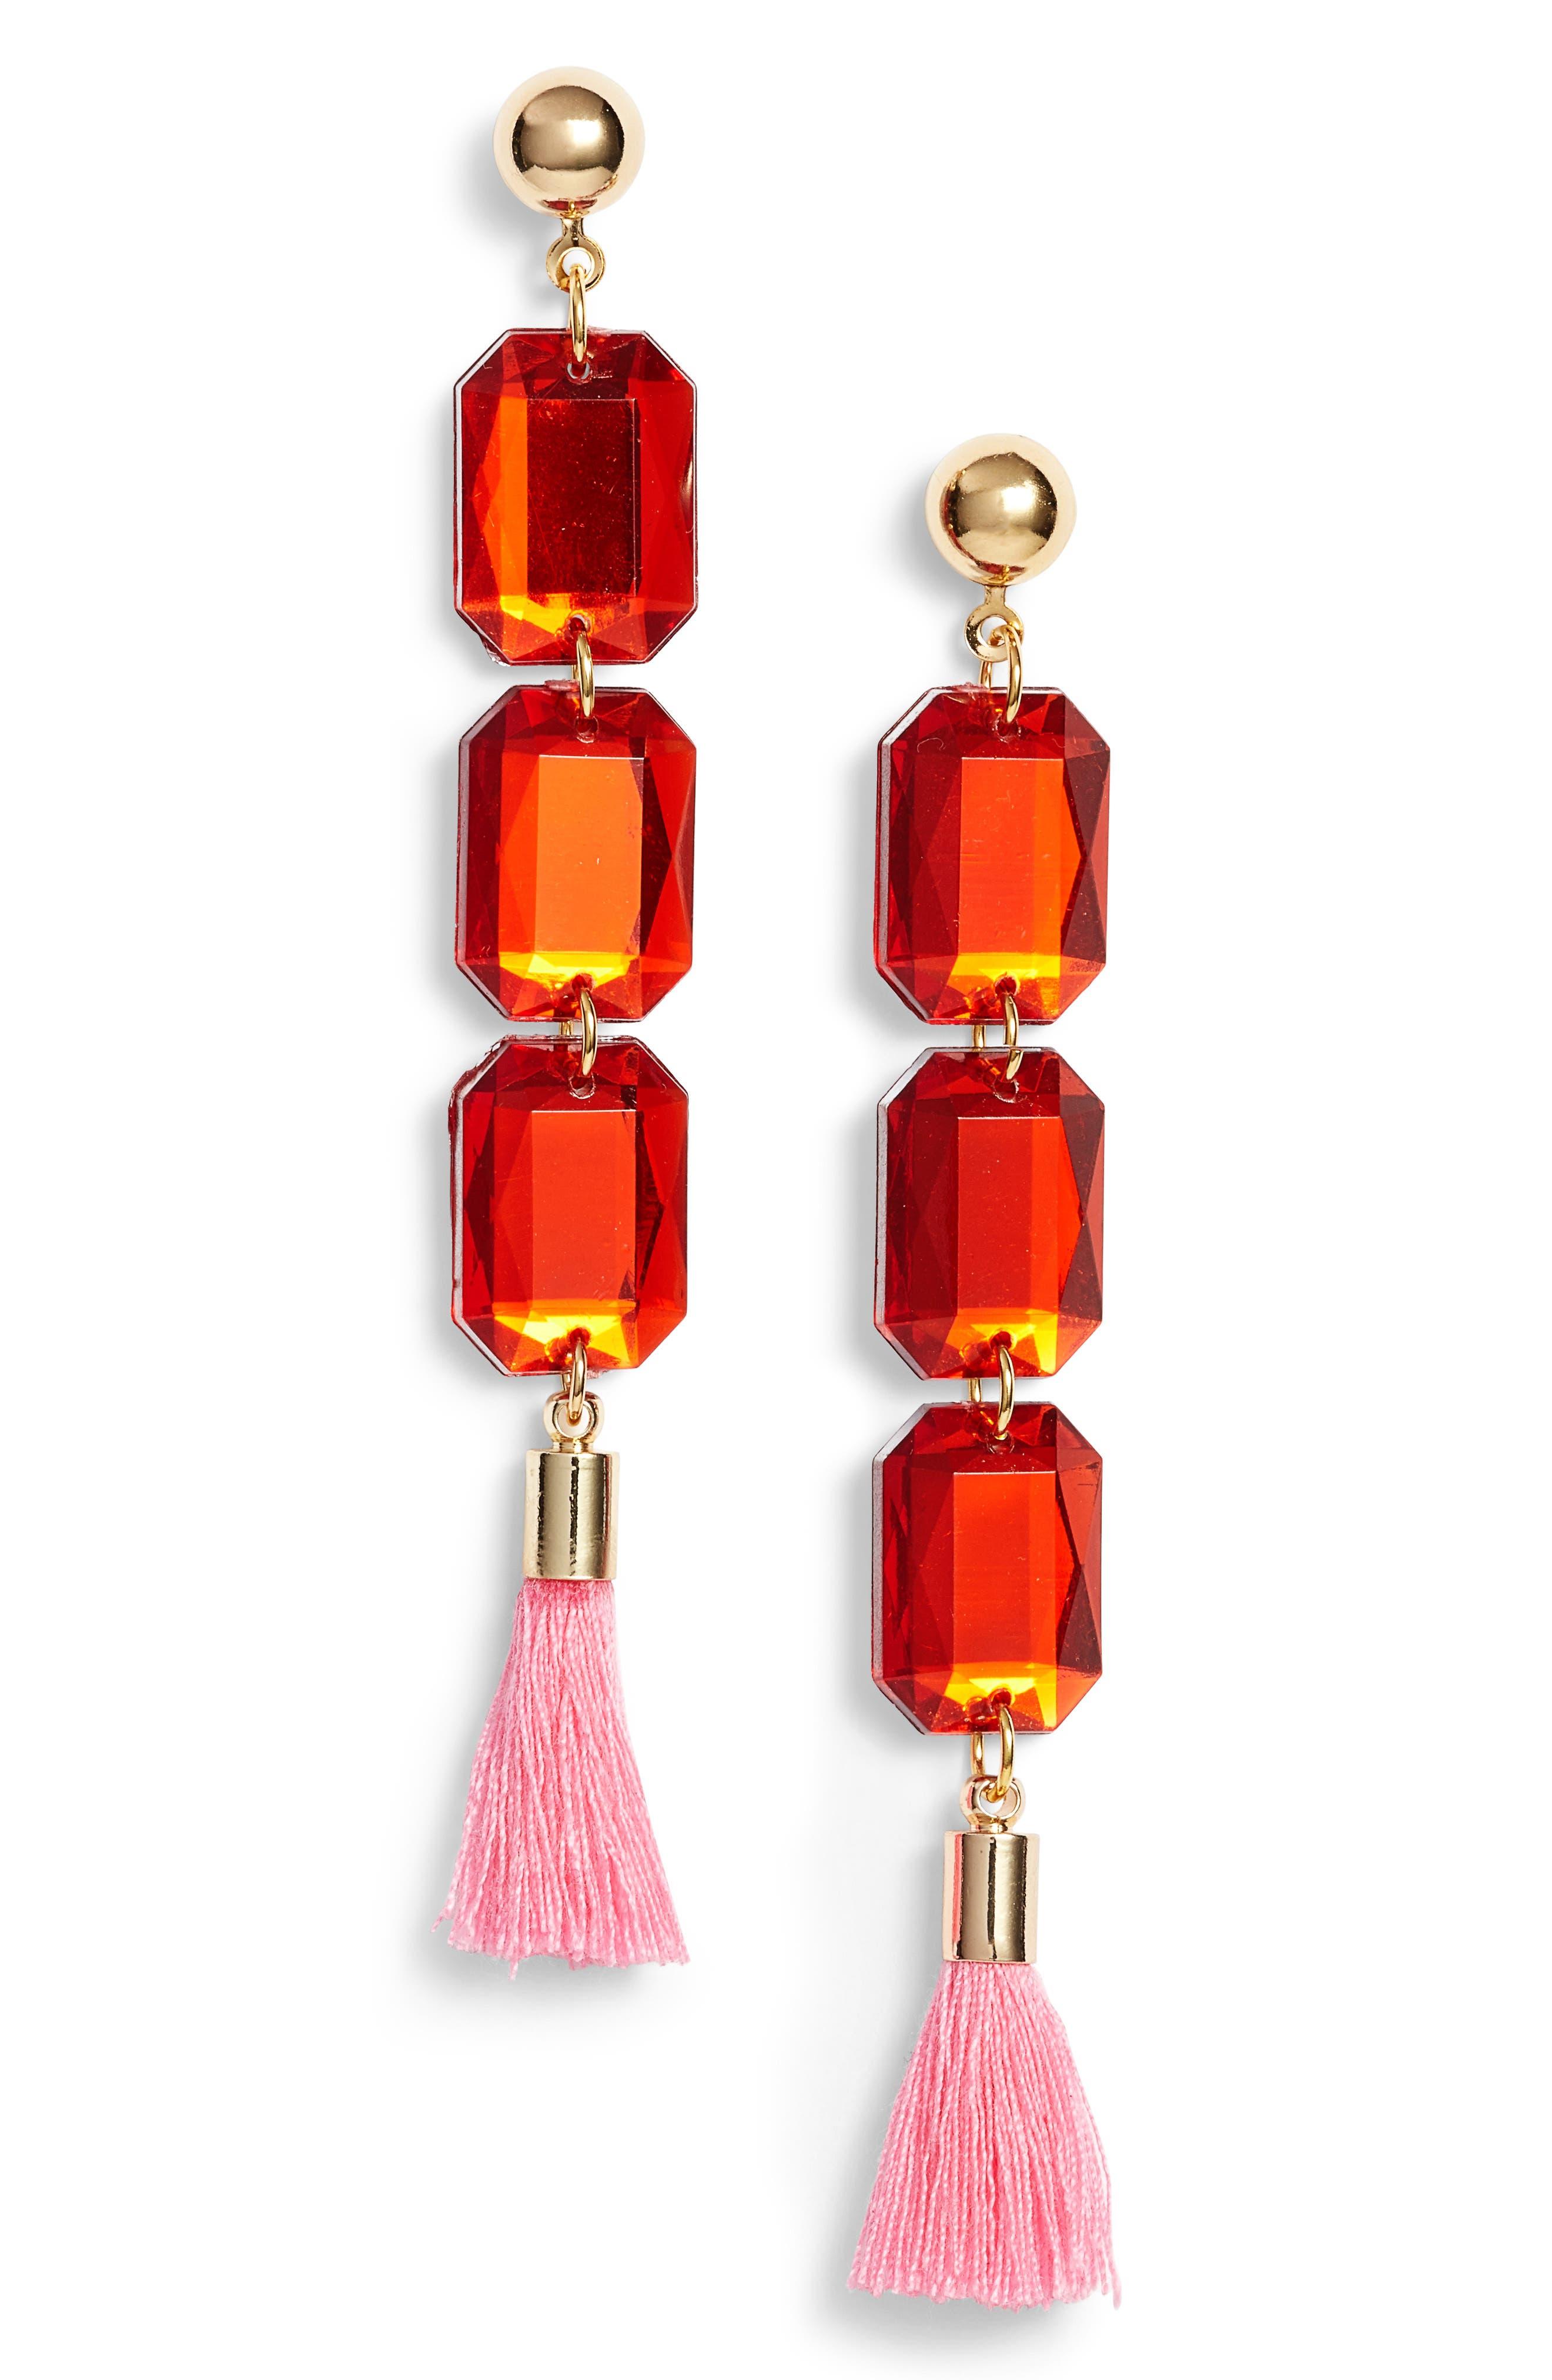 Bon Bon Drop Earrings,                             Main thumbnail 1, color,                             Gold/ Red/ Pink